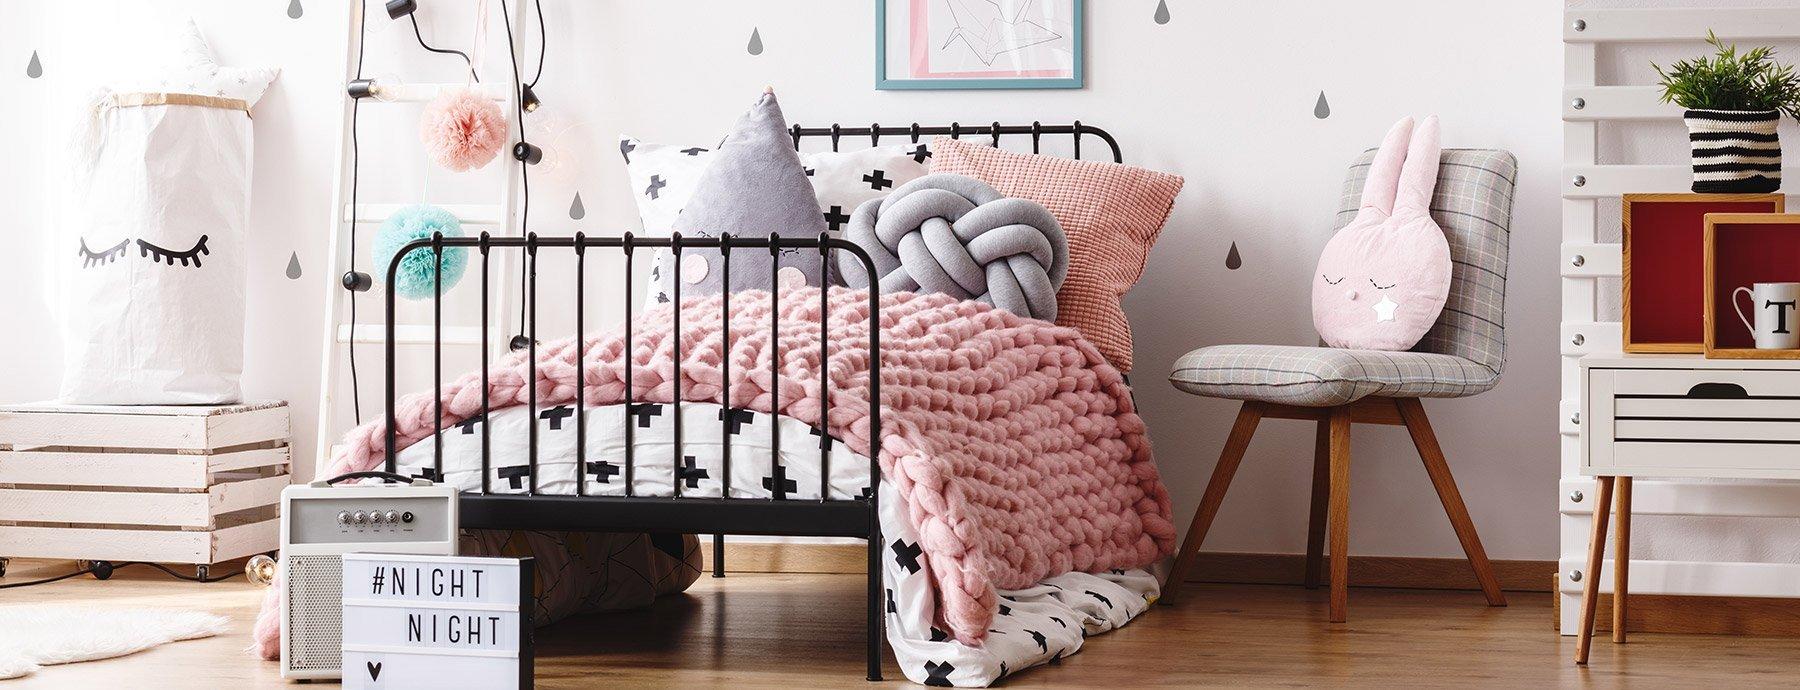 Decor Ideas for Girl Bedroom Beautiful the Best Girl Bedroom Ideas